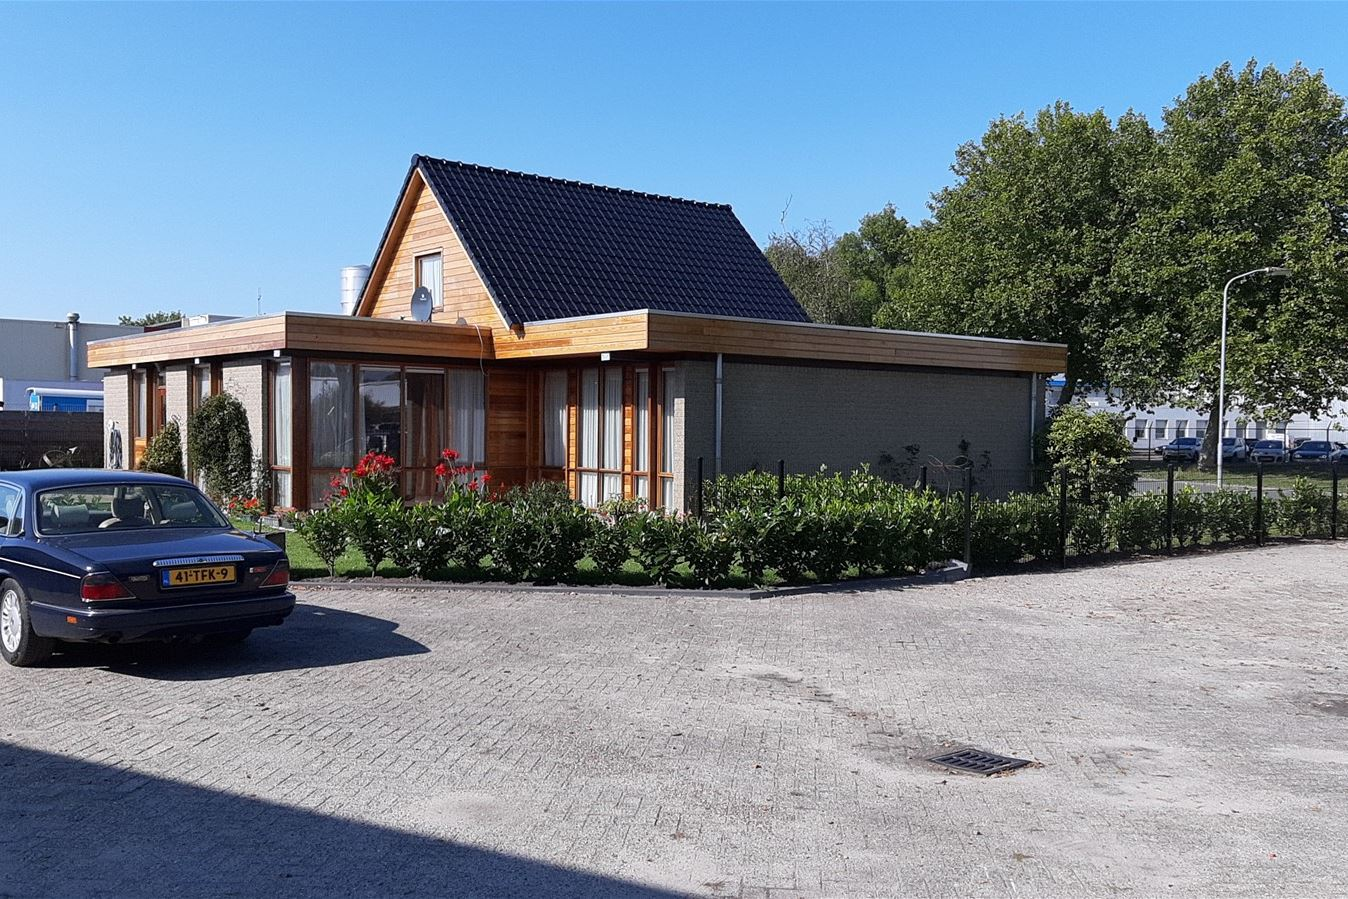 View photo 2 of Nijverheidsweg 14 -14a